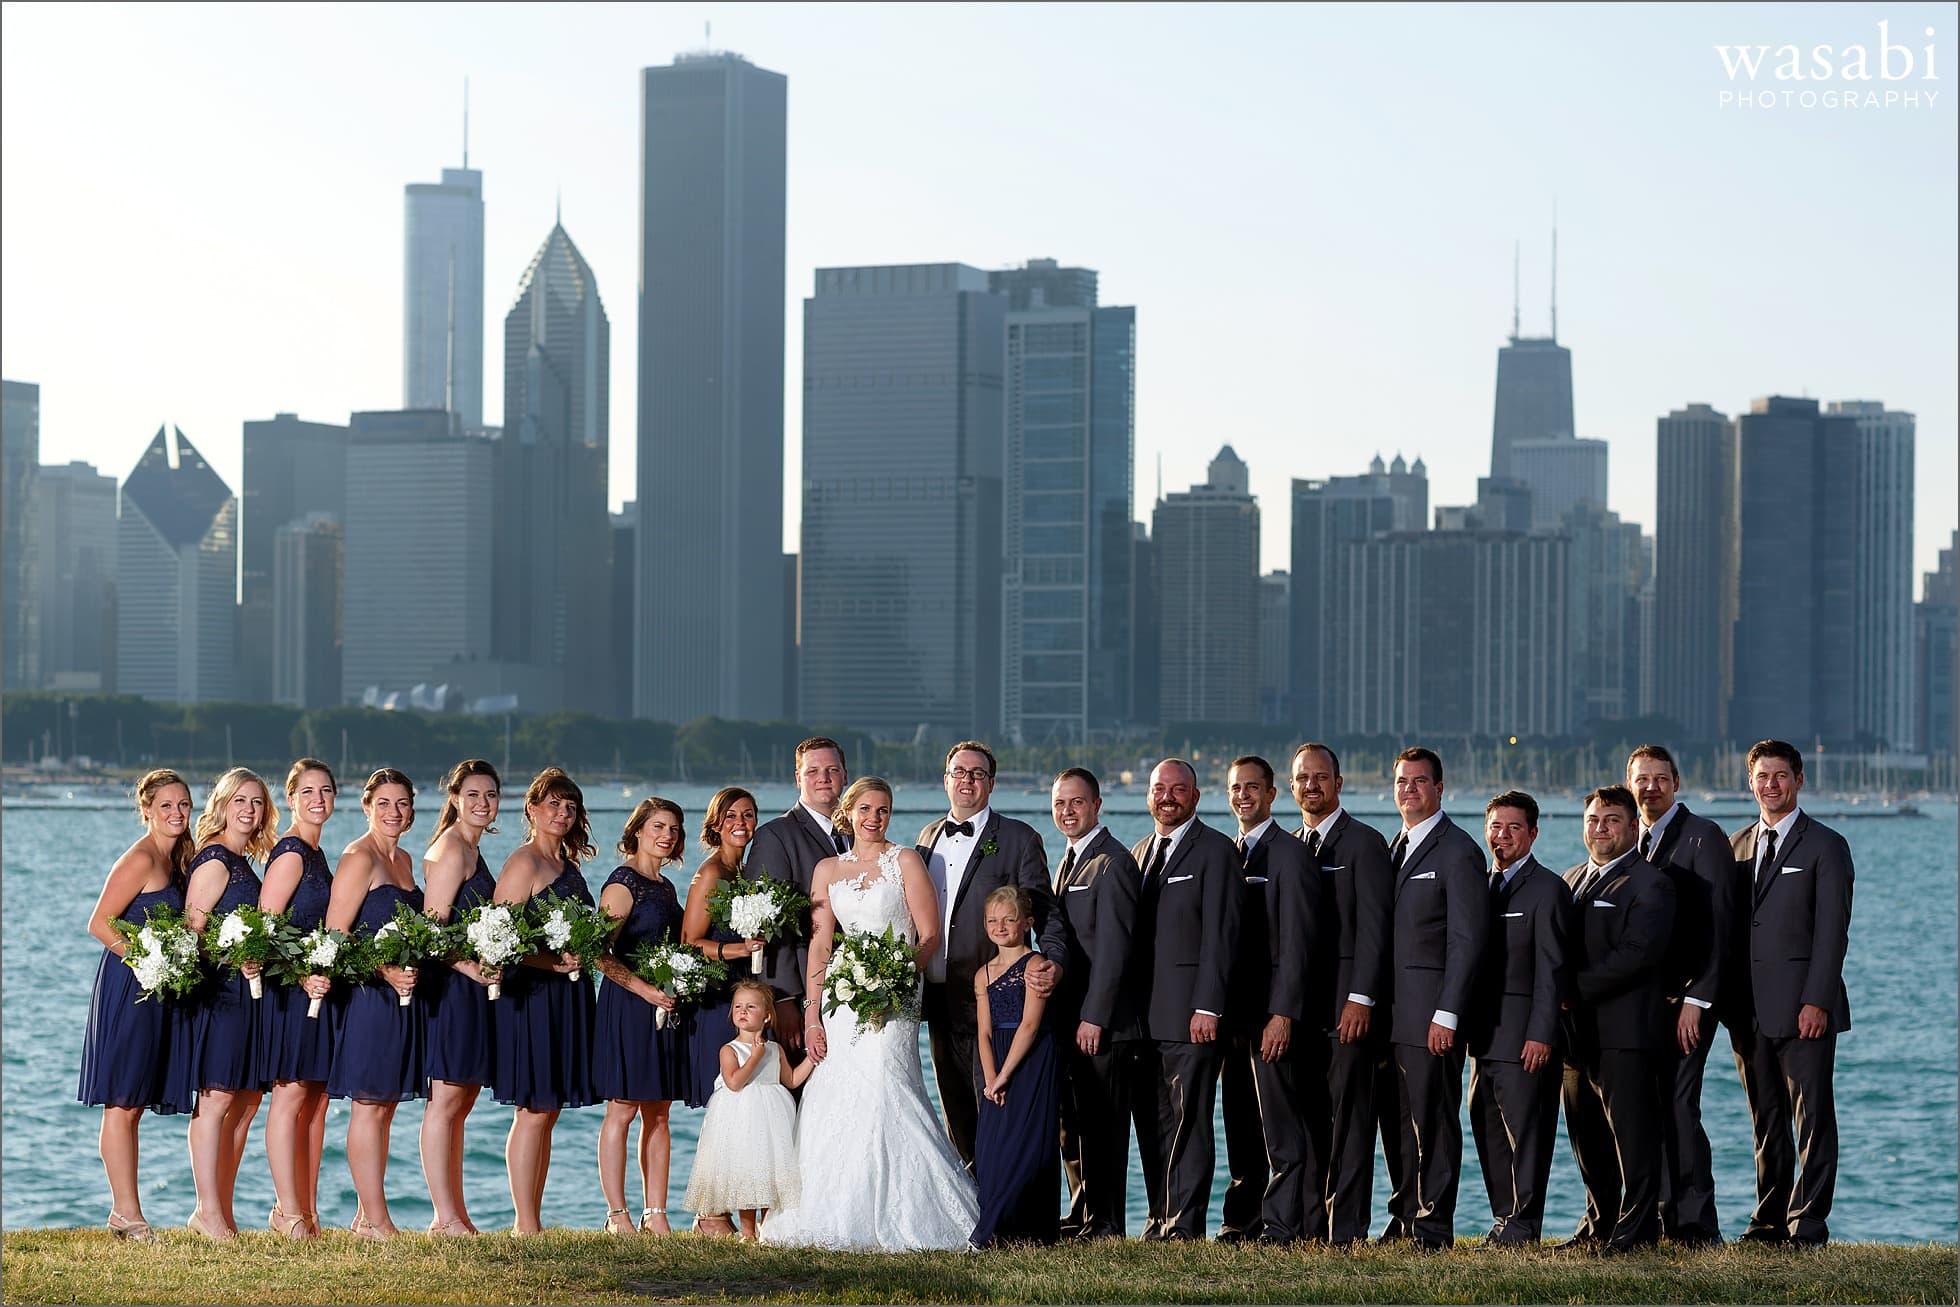 adler planetarium wedding party photos